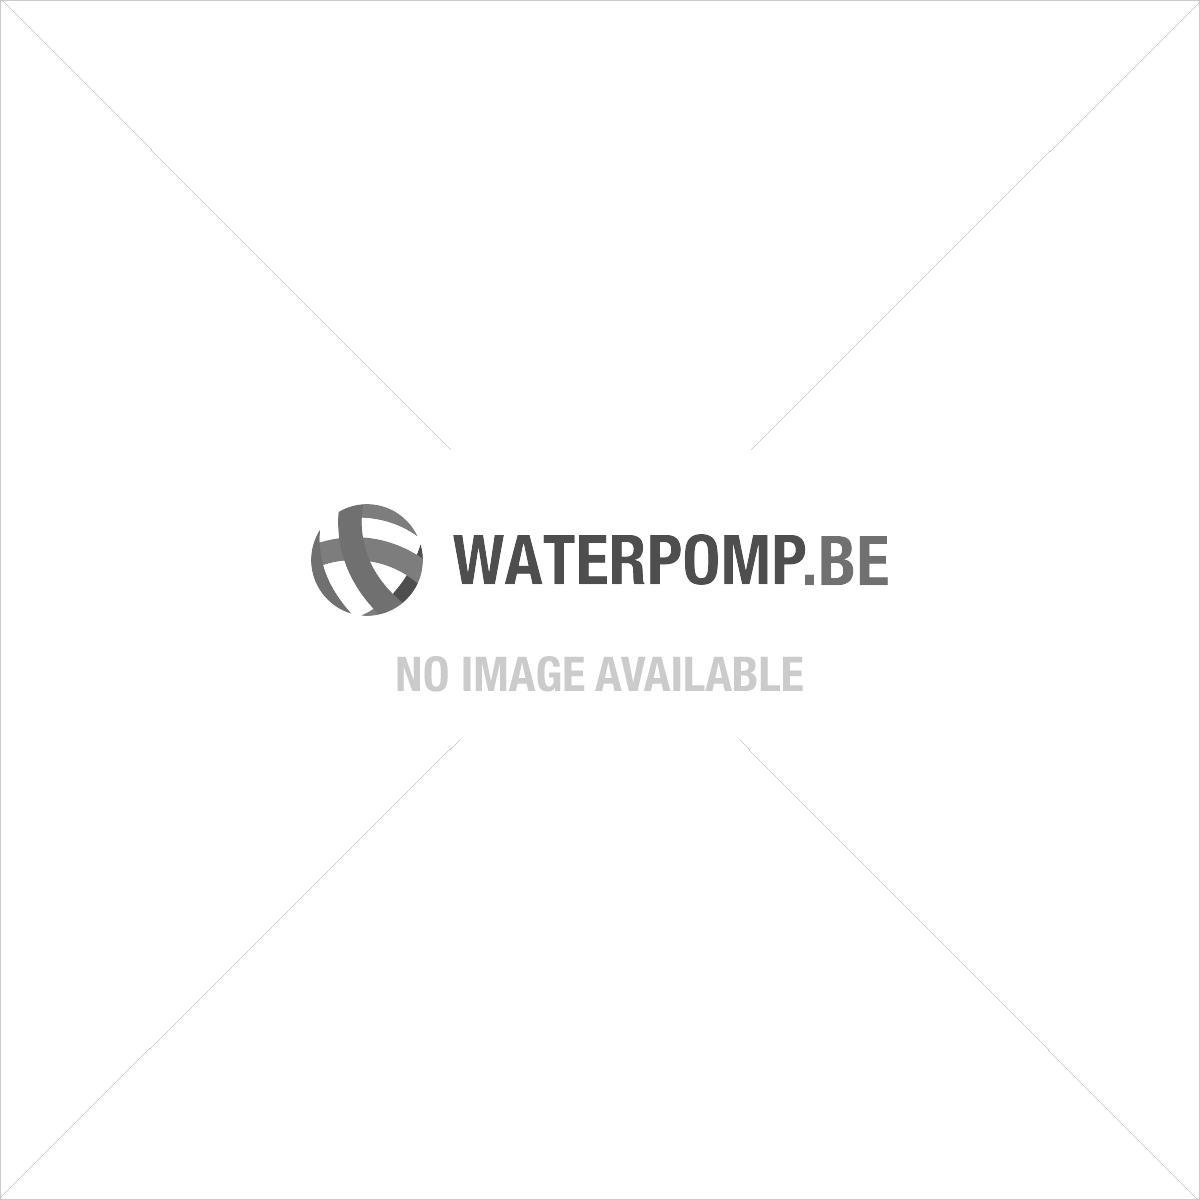 dab evosta 40 70 130 circulatiepomp cv pomp waterpomp. Black Bedroom Furniture Sets. Home Design Ideas